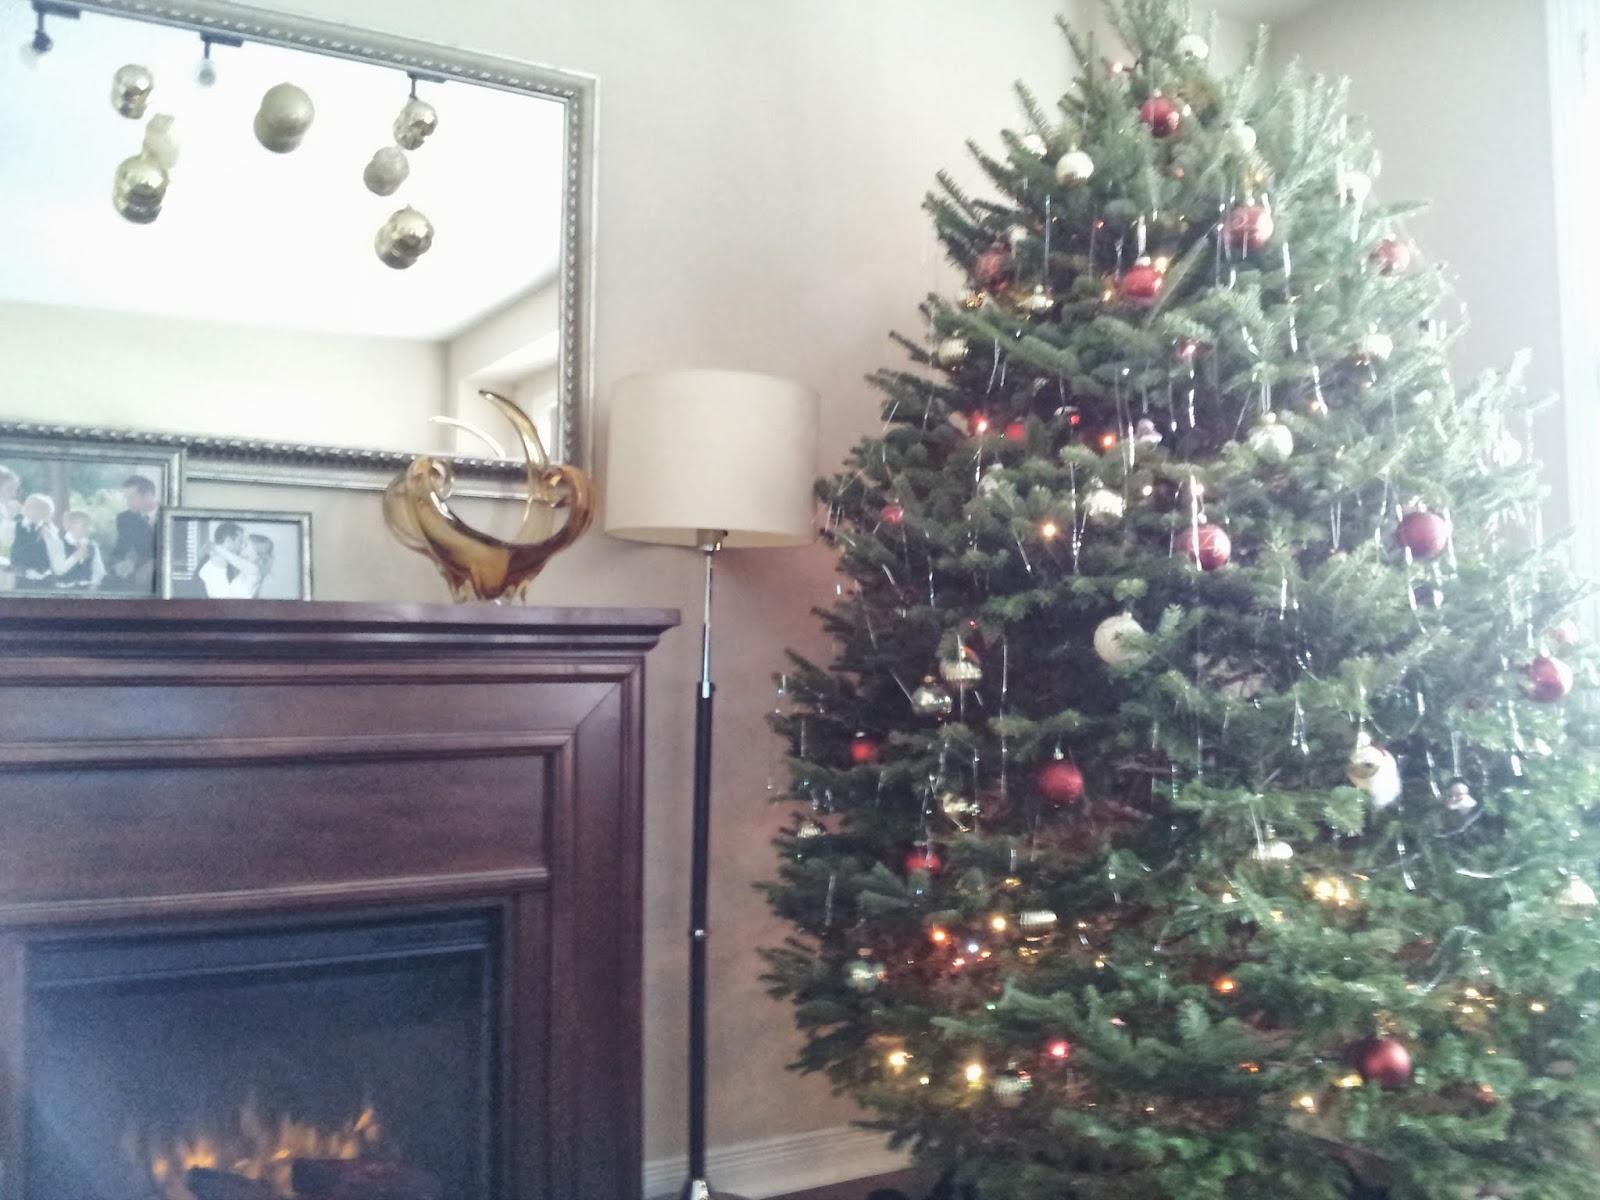 Christmas, tree, decorations, ornaments